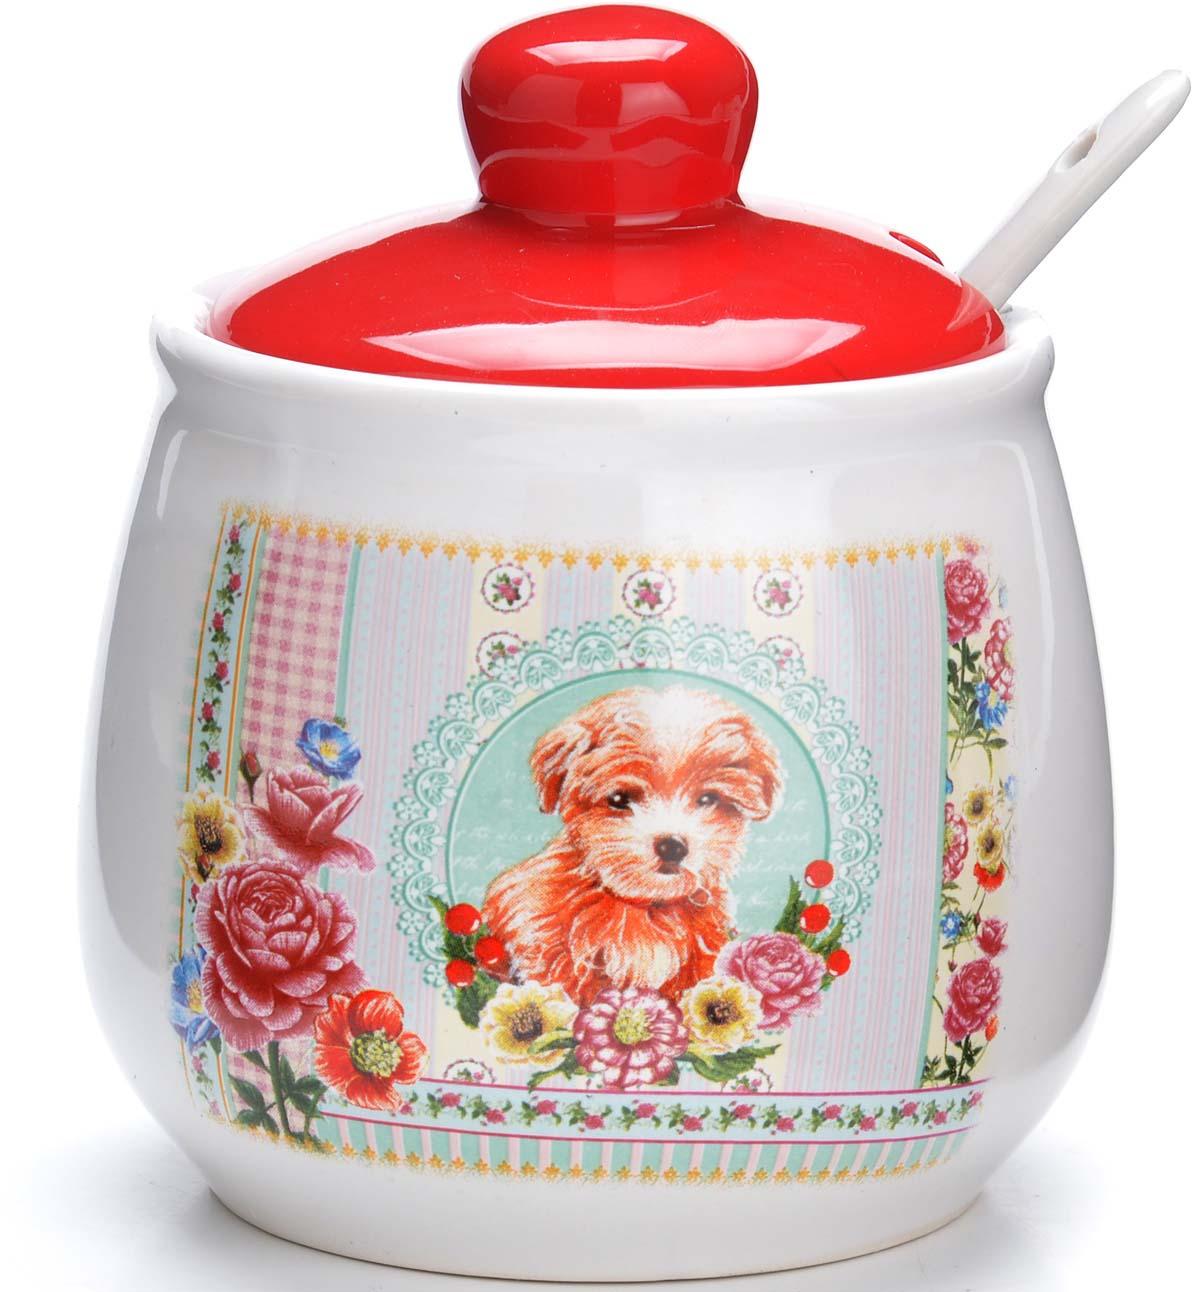 Сахарница Loraine Собачки, цвет: белый, голубой, розовый, 400 мл. 94969 сахарница rosanna good doggie цвет белый золотистый